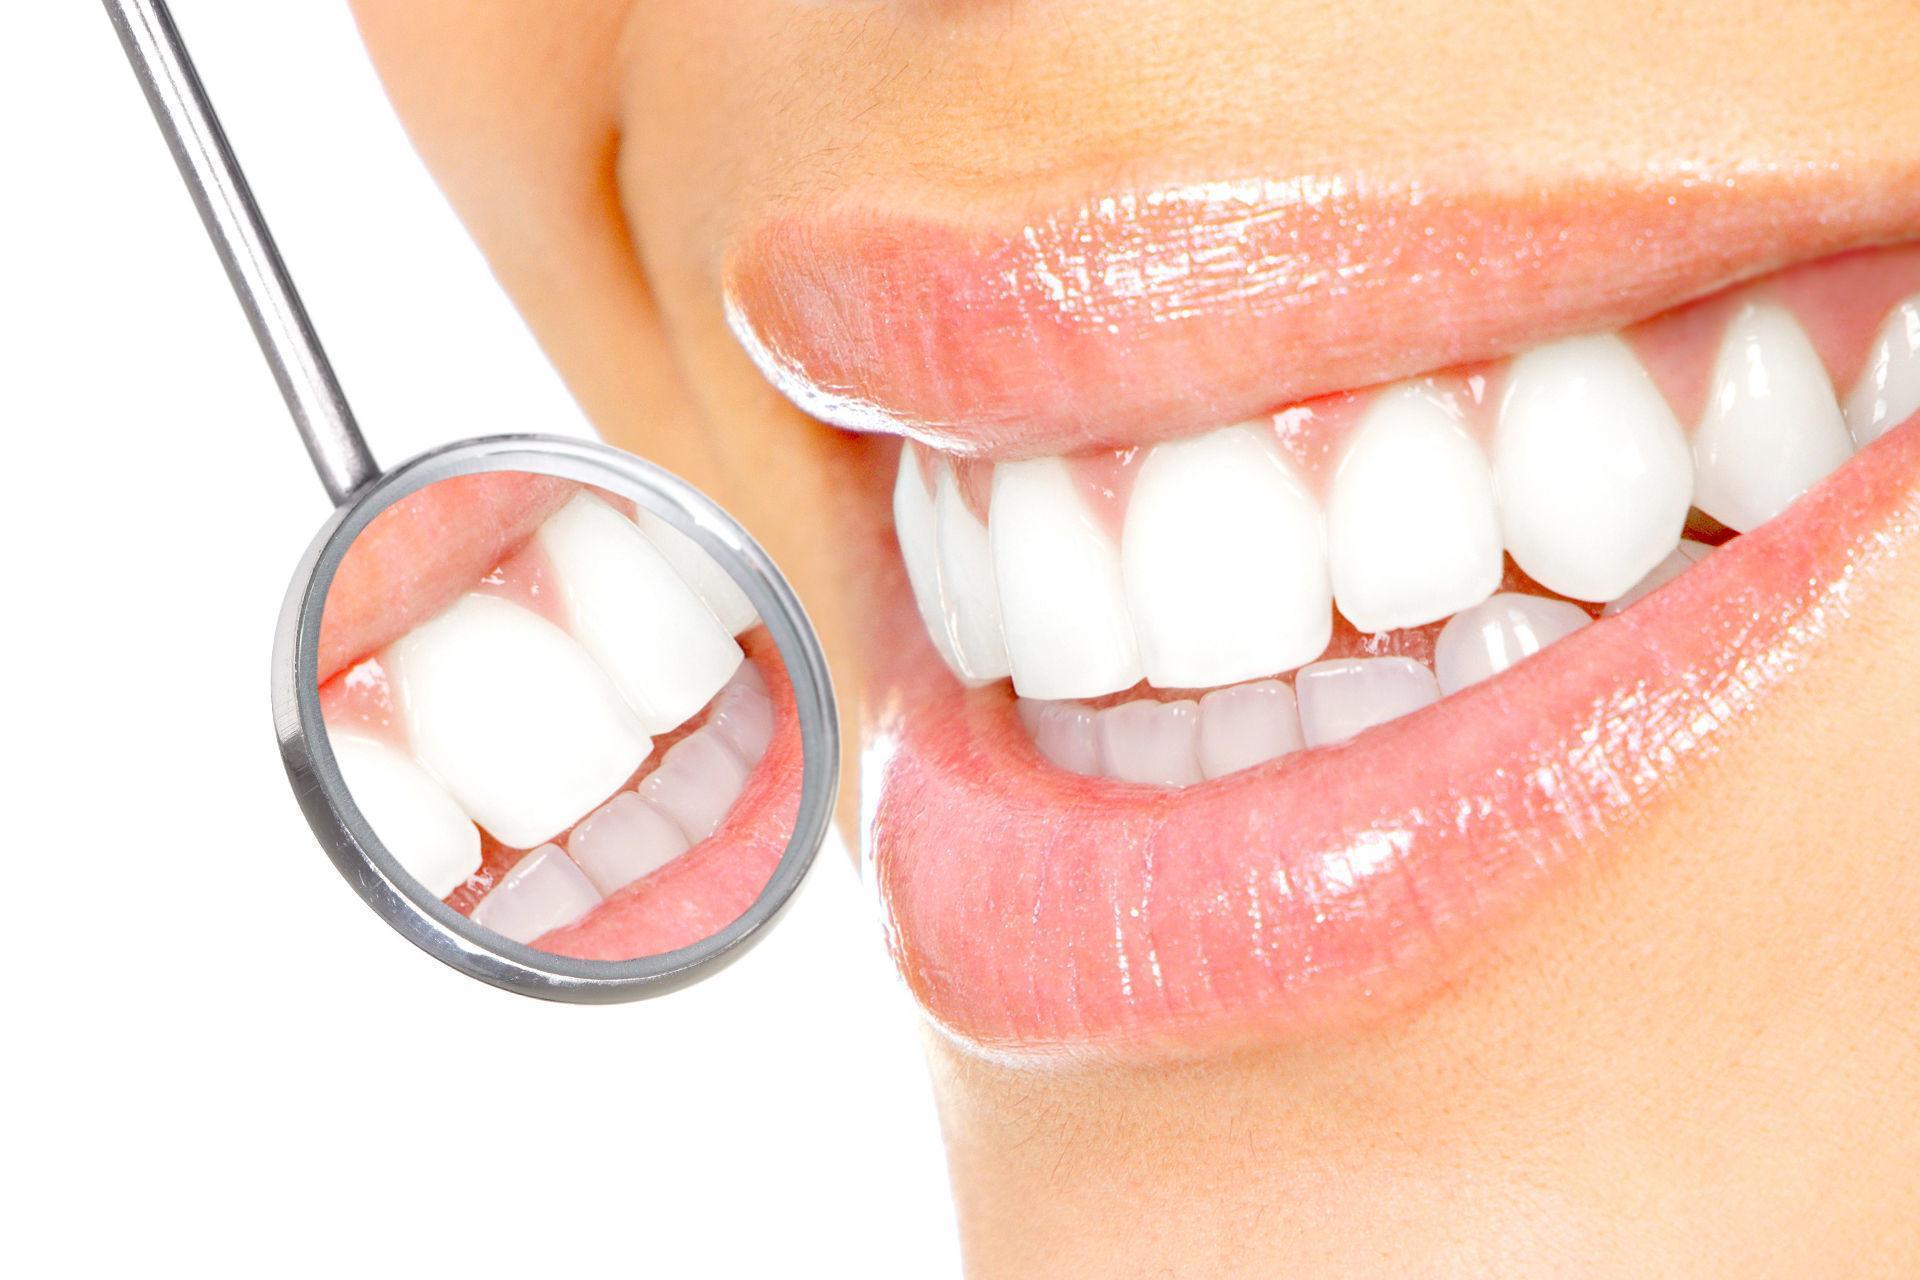 Desgaste do Esmalte do Dente: Sintomas e Tratamentos